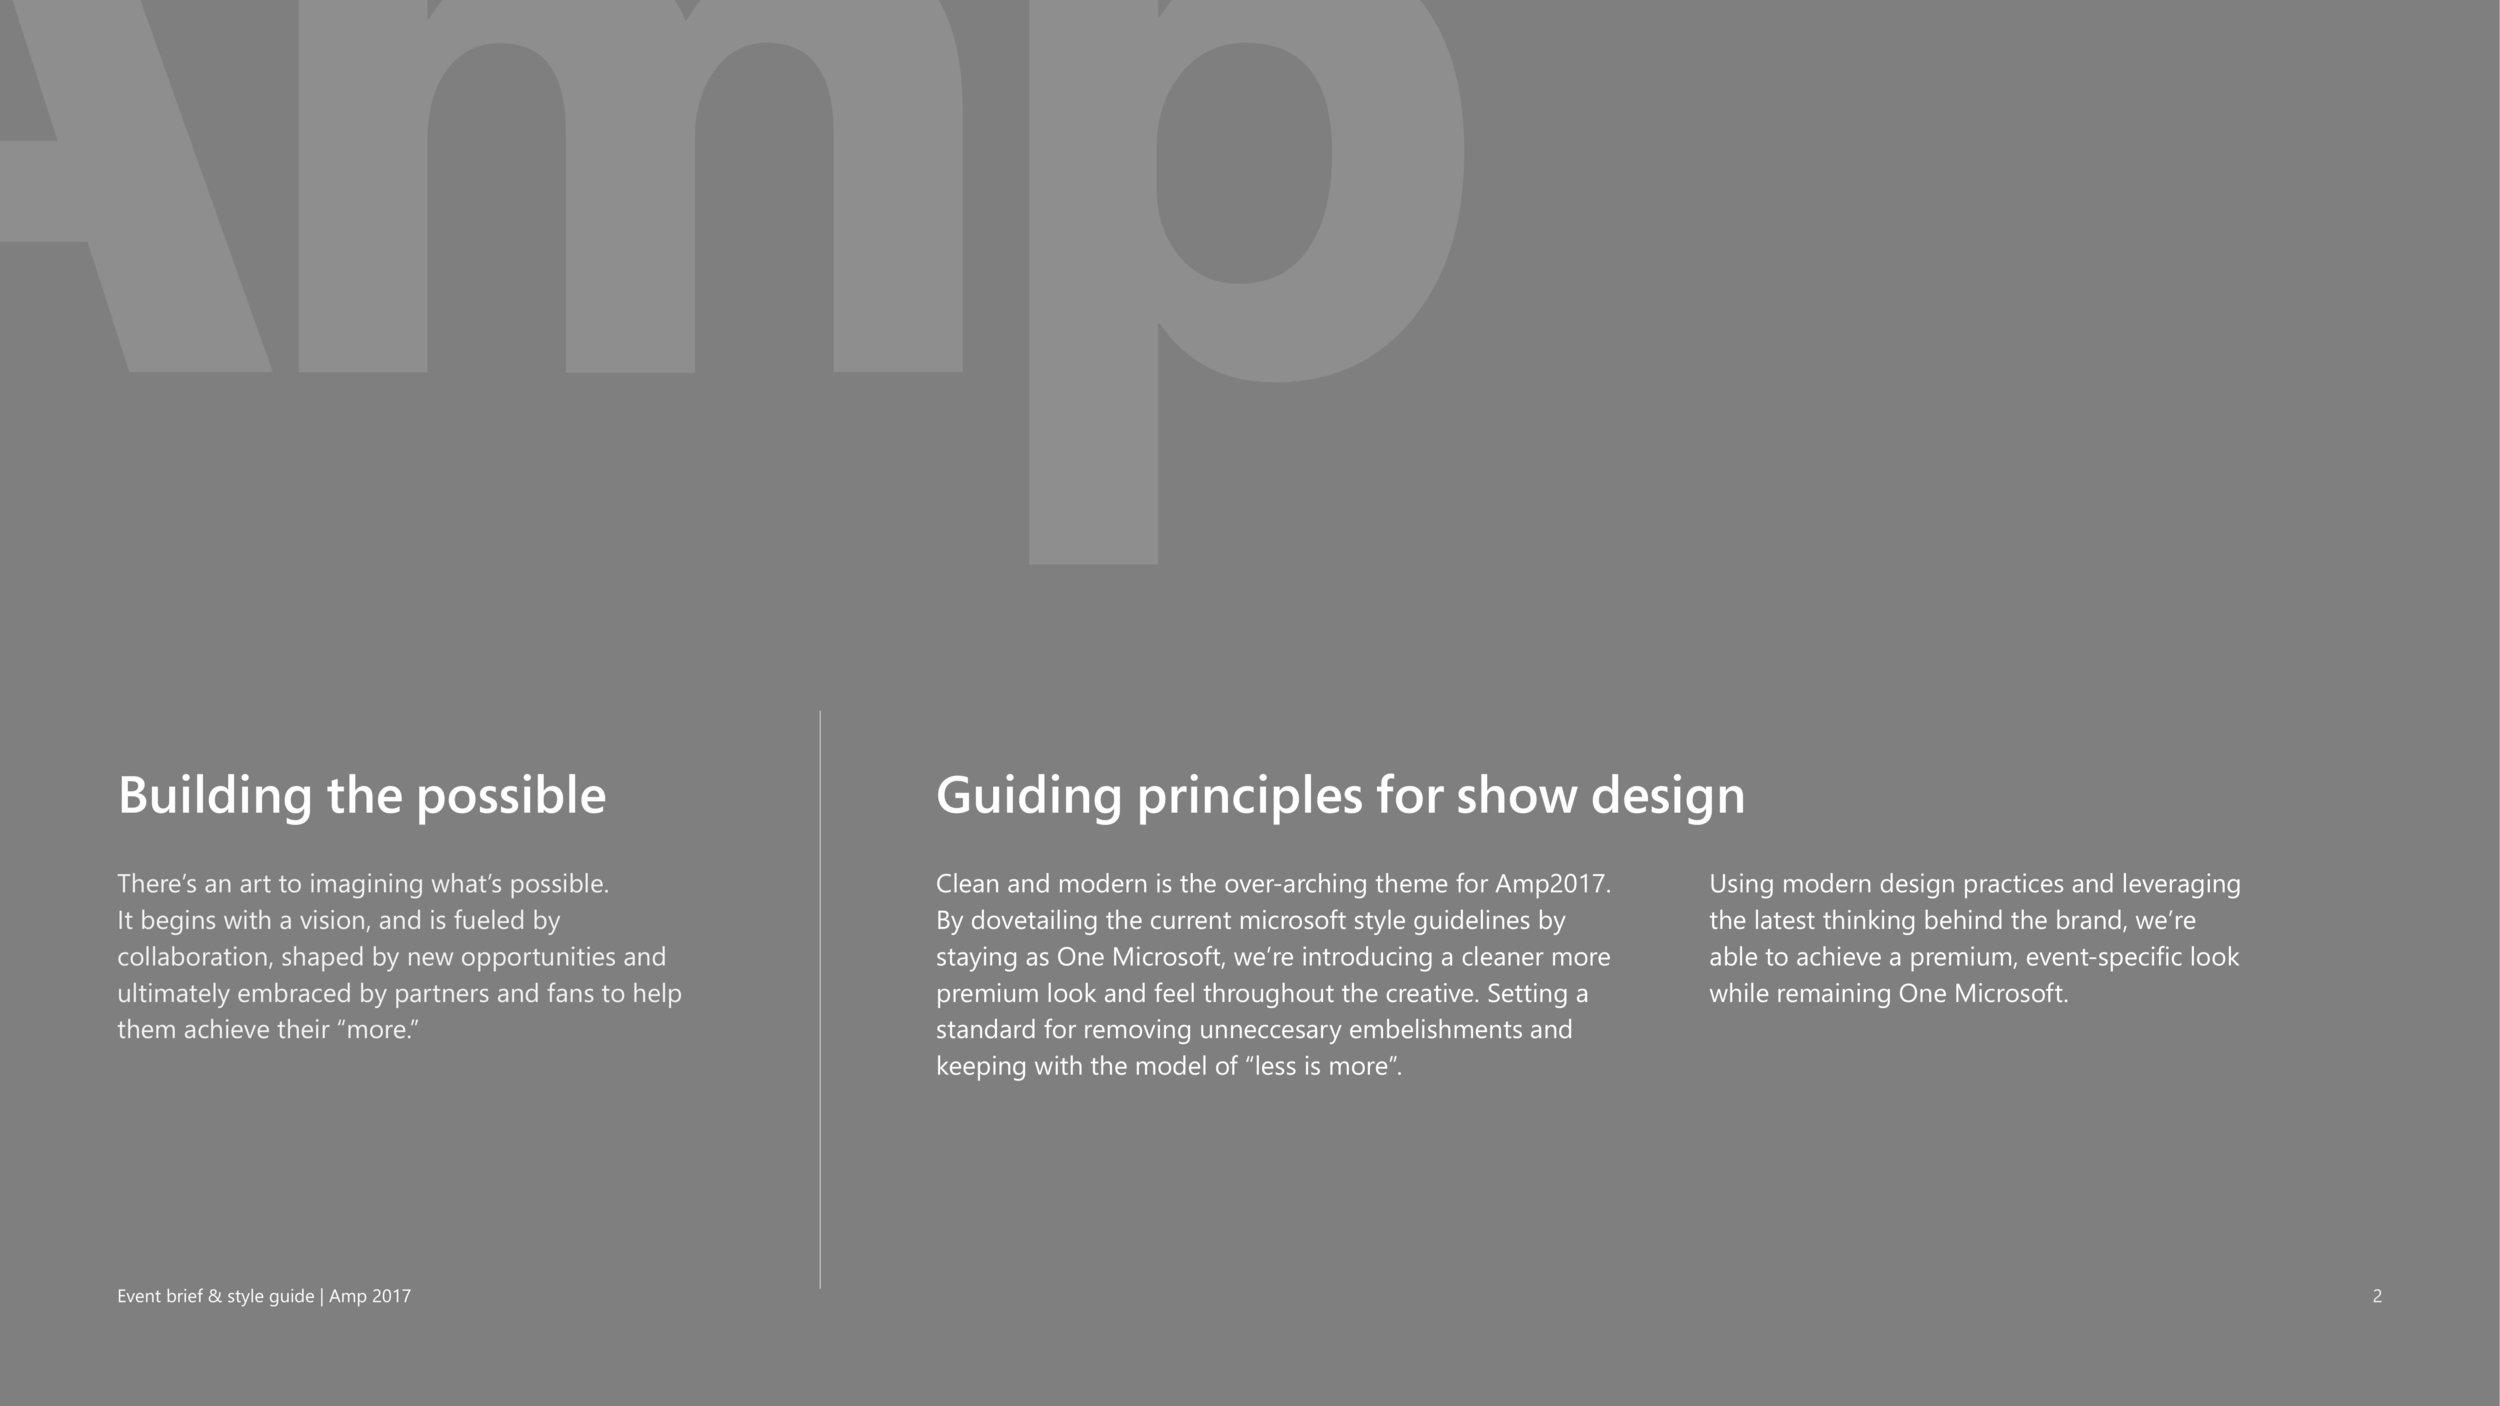 AMP_2017_Style_Guide_190629_1030-02.jpg